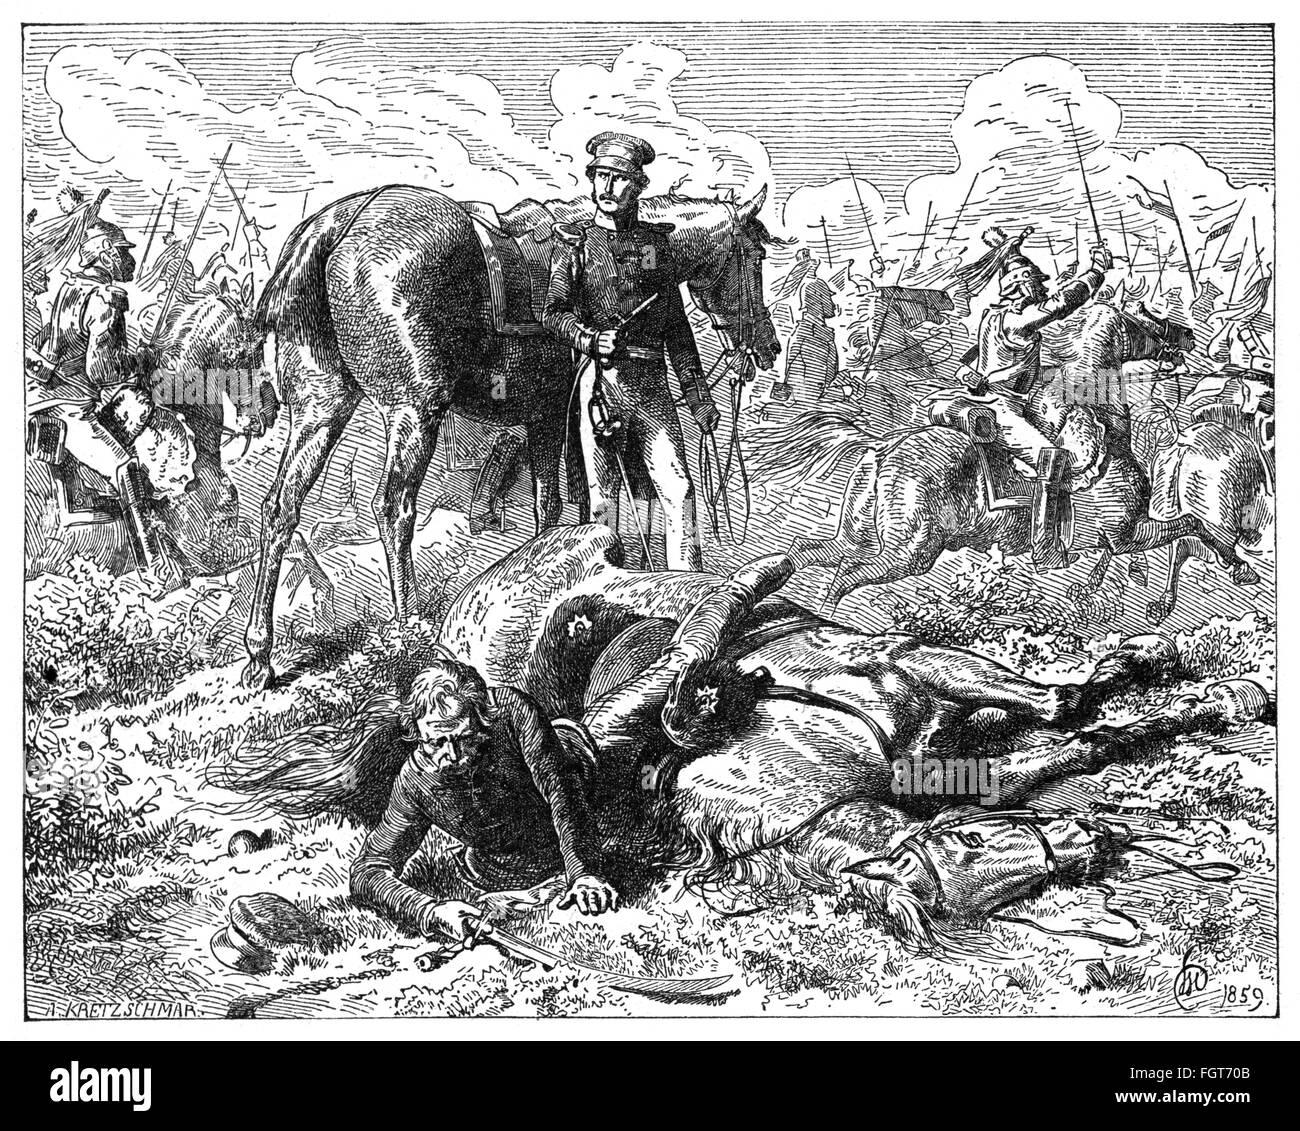 War of the Seventh Coalition 1815, Battle of Ligny, 16.6.1815, field marshal Gebhard Leberecht von Bluecher under - Stock Image